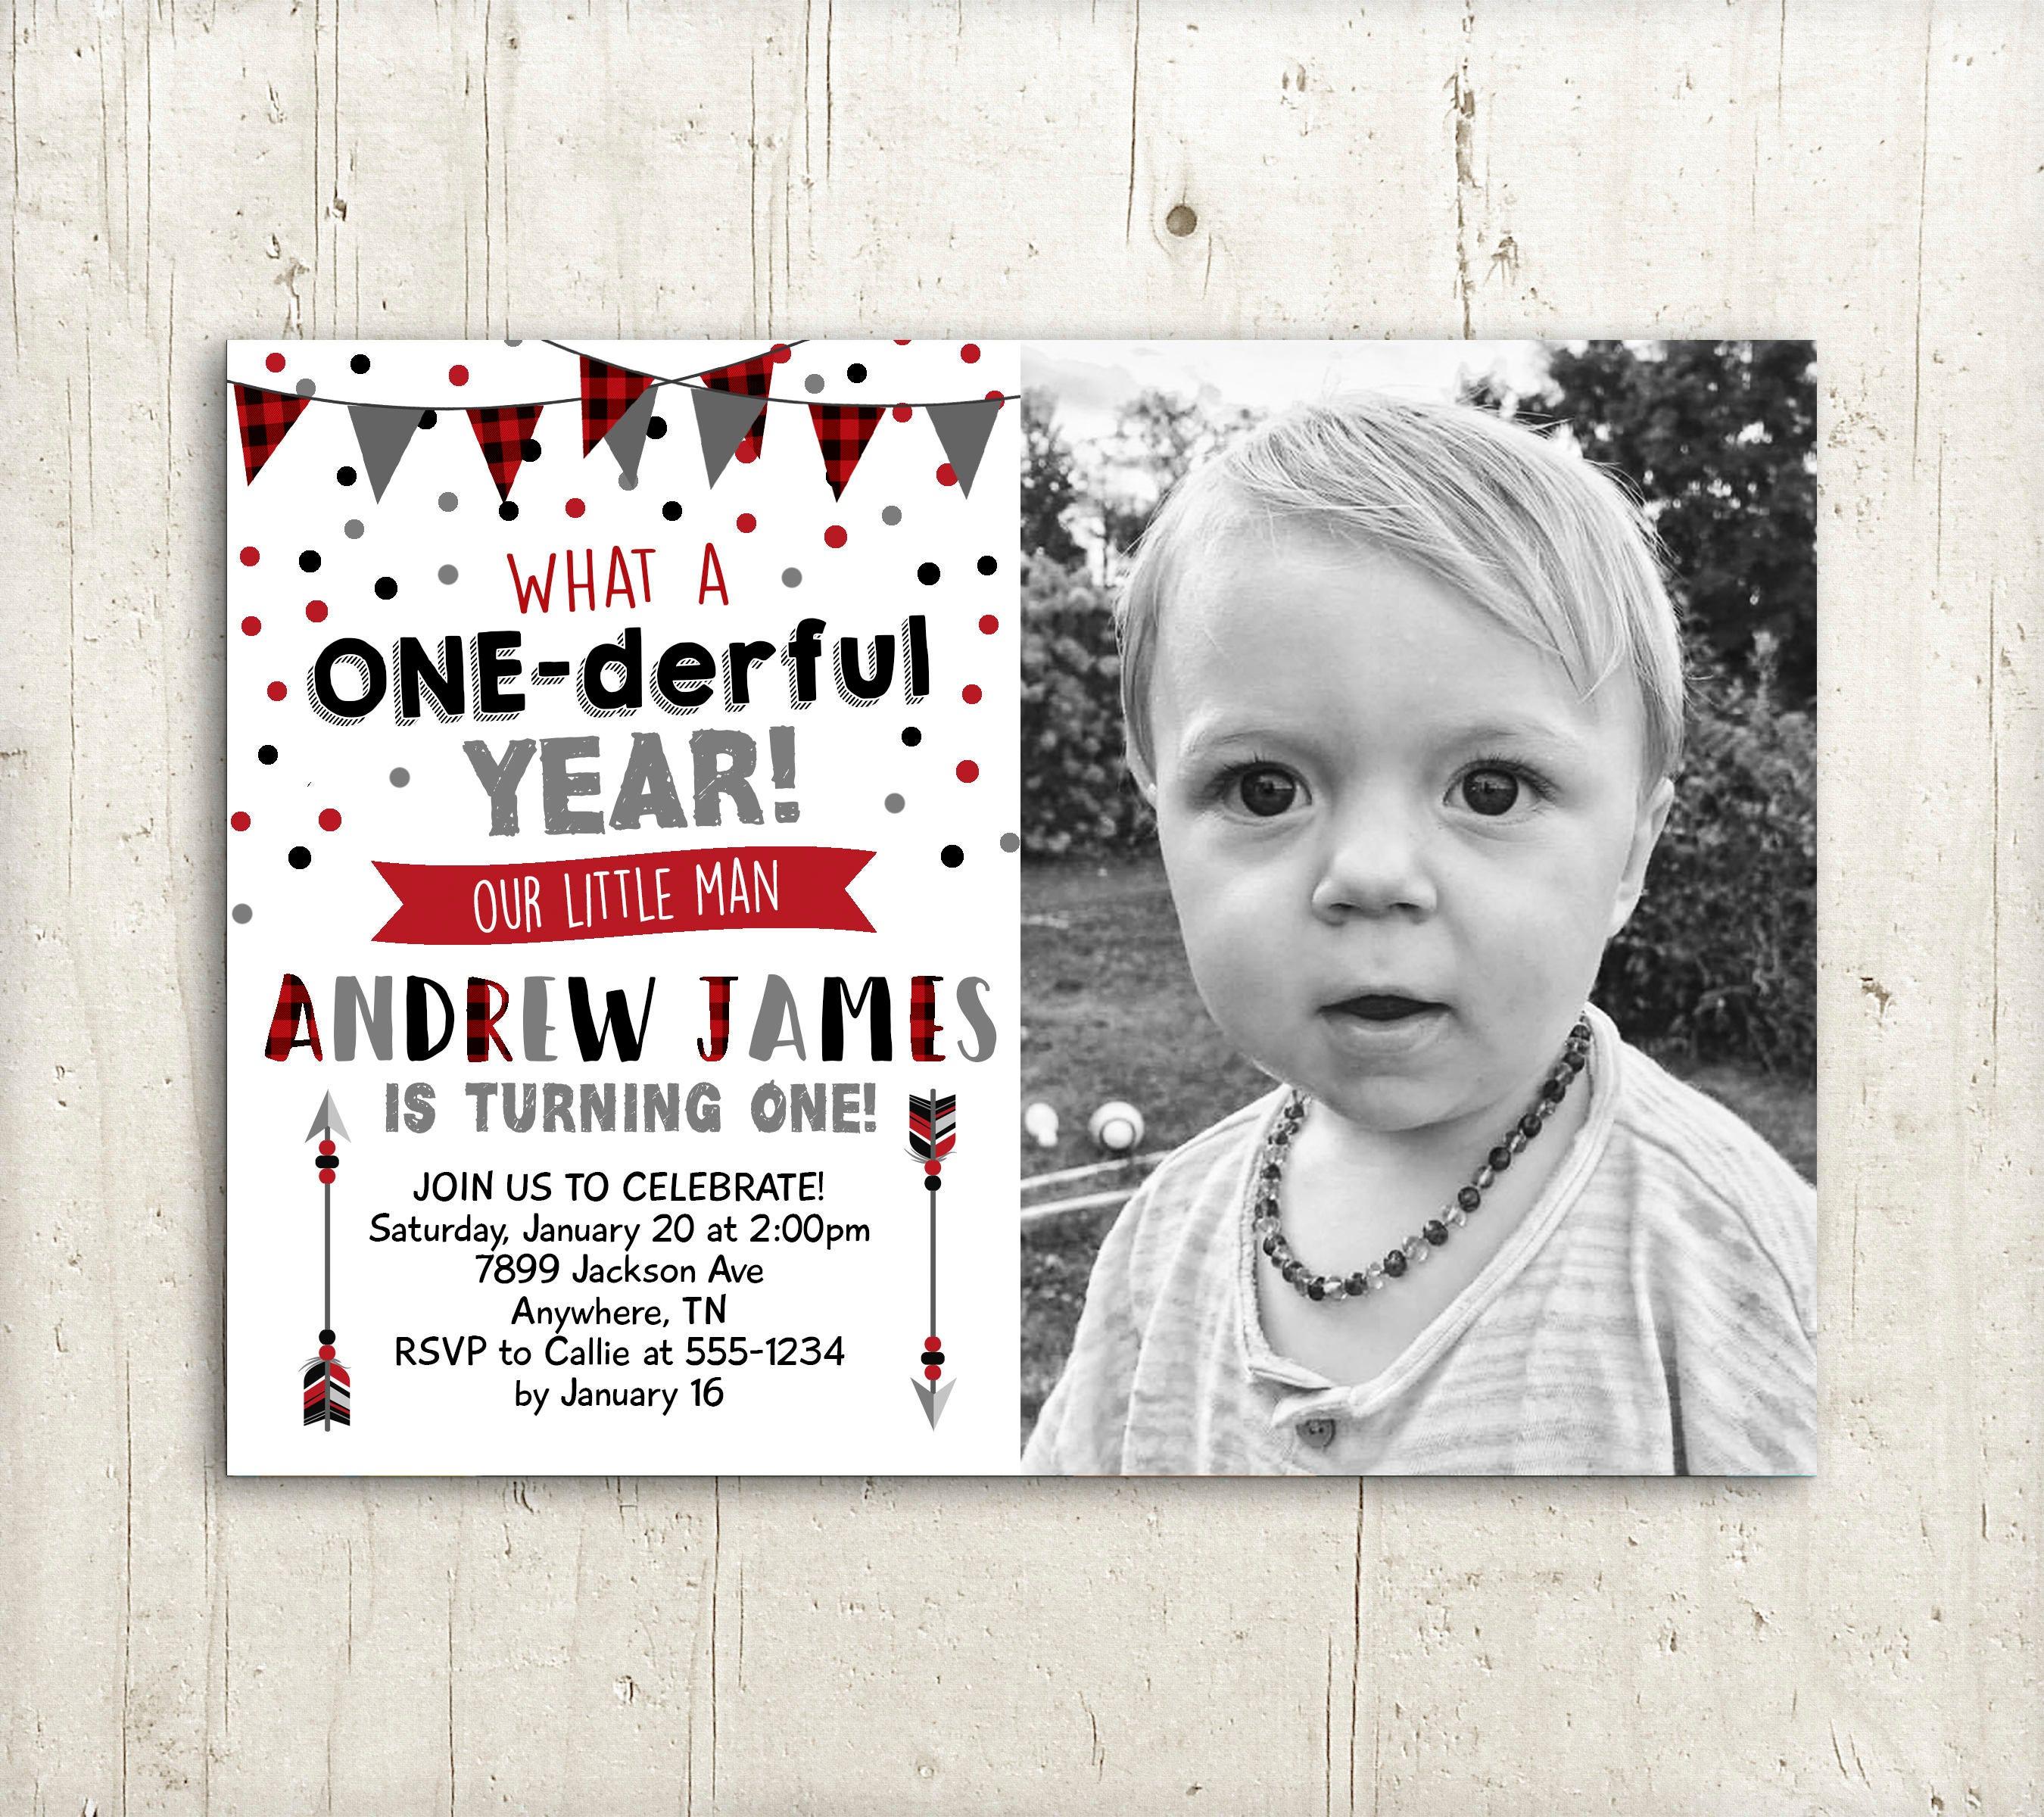 Boys First Birthday Invitation One-derful Year Birthday   Etsy